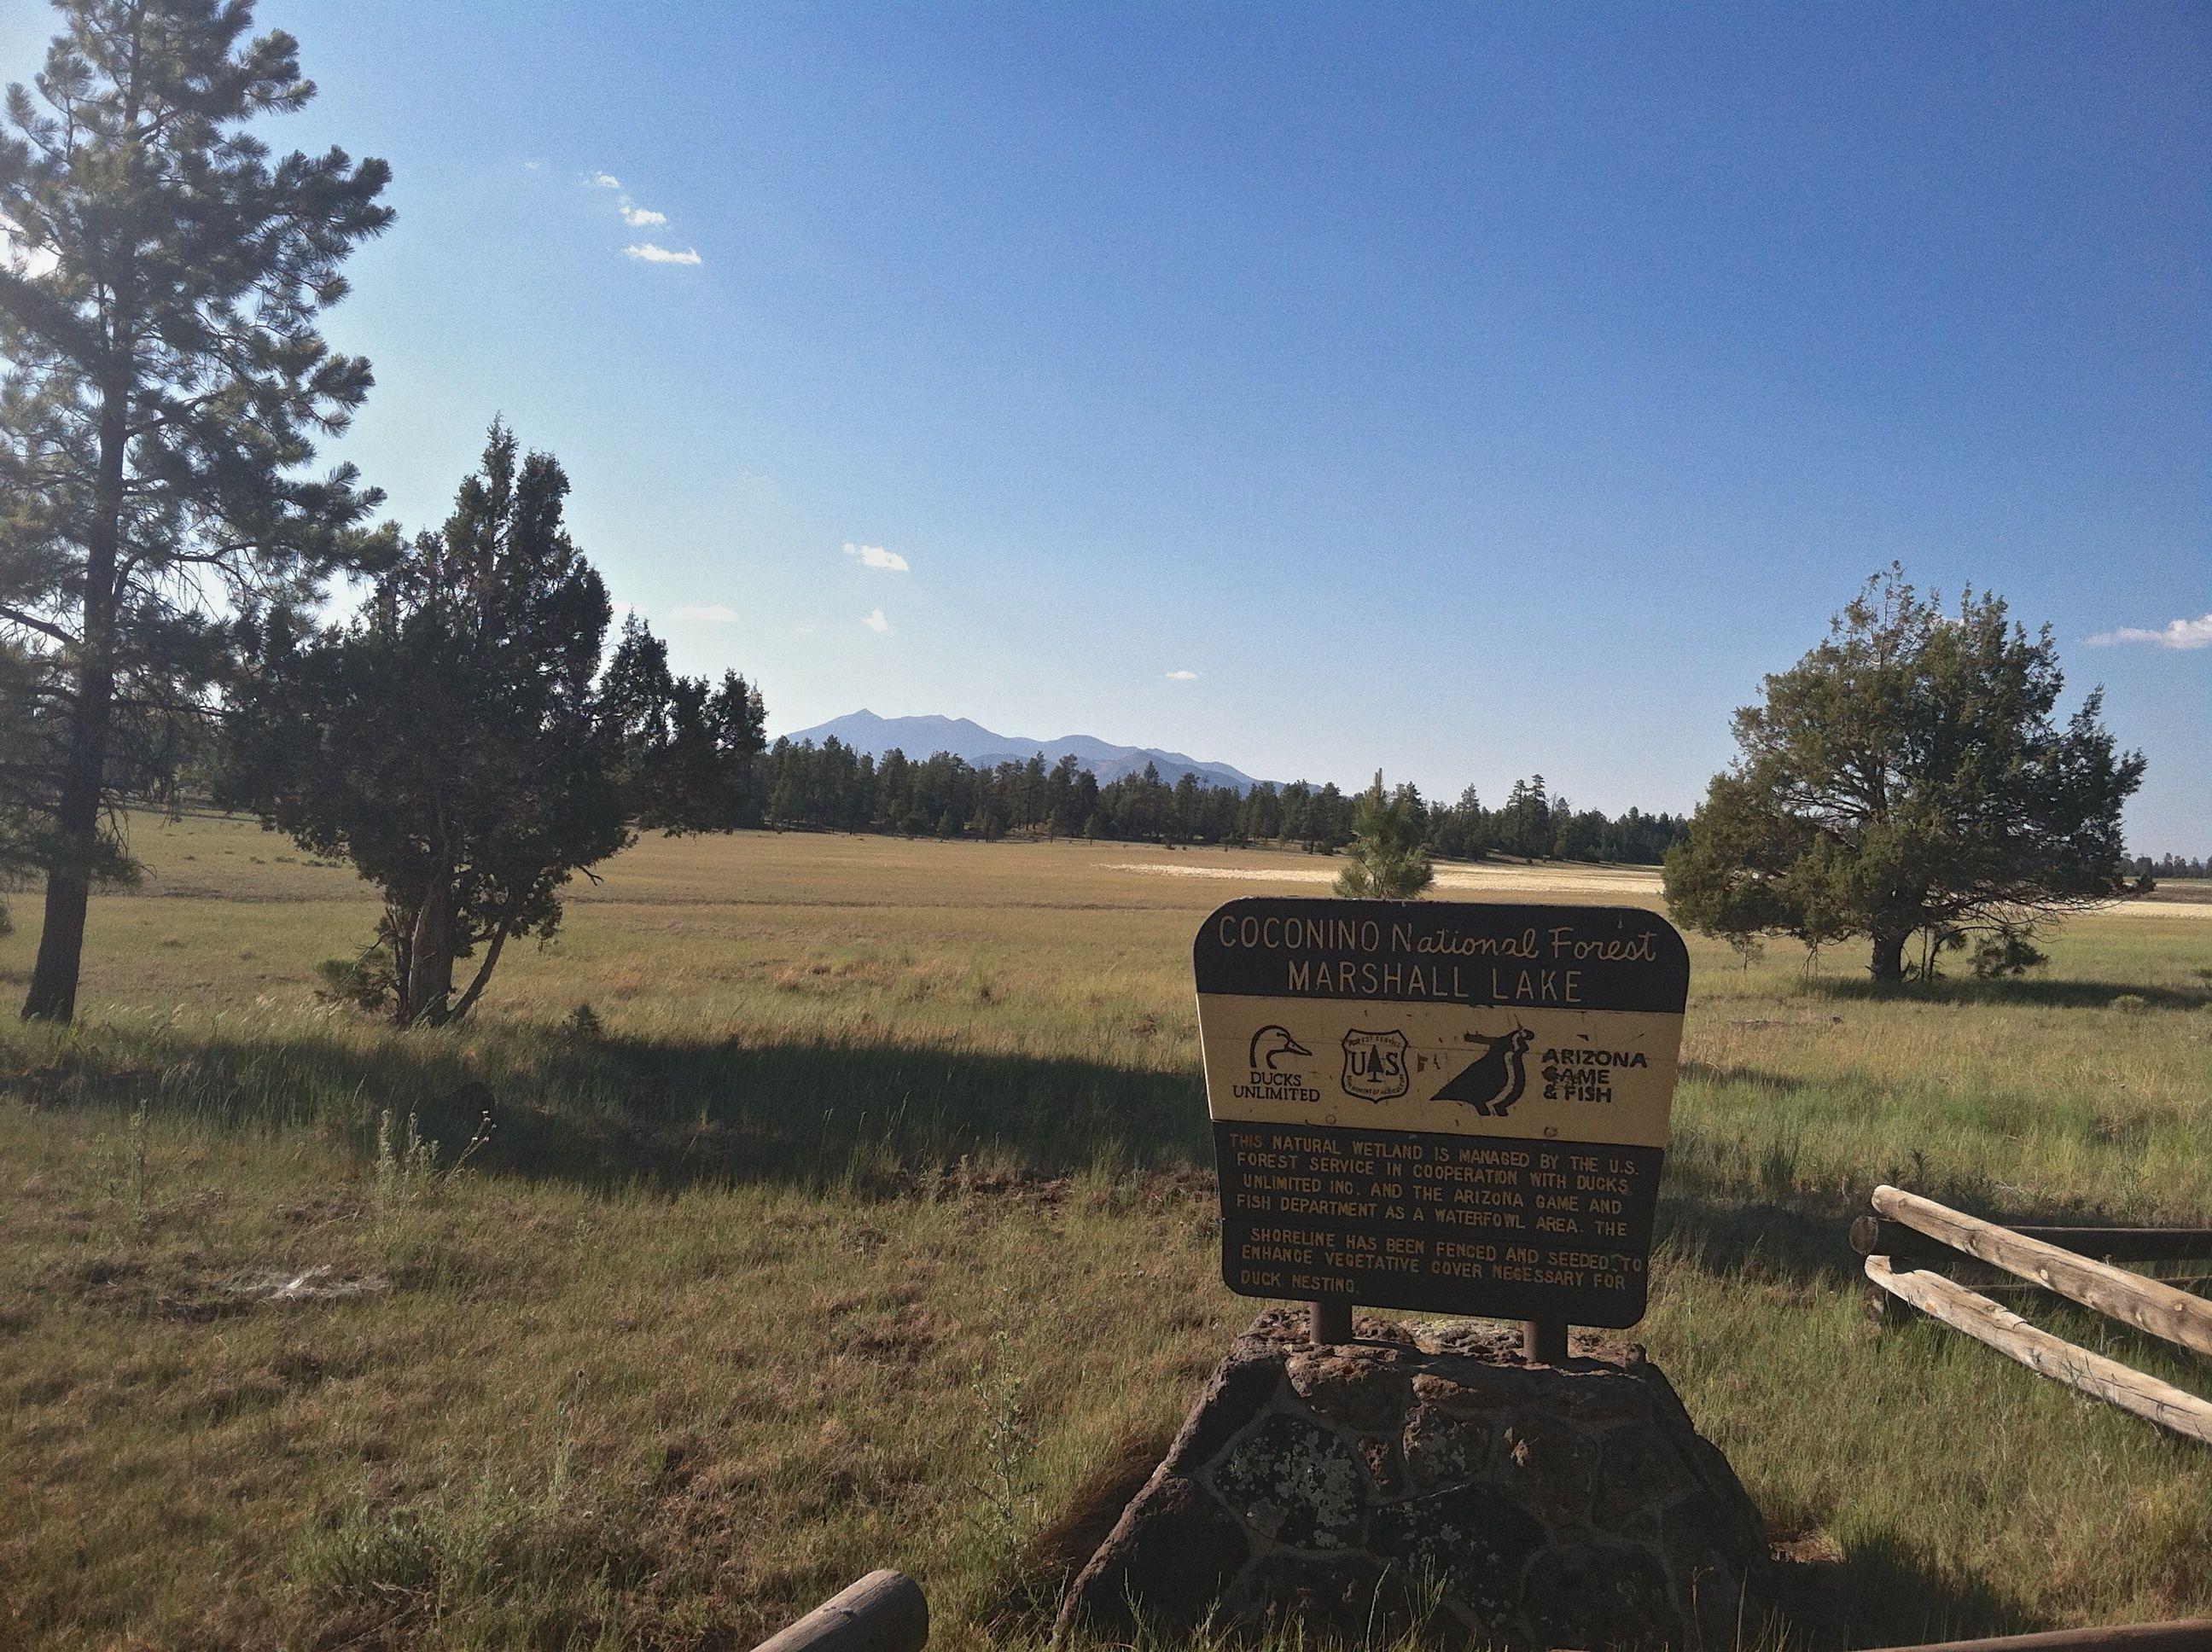 mormon lake Mormon lake is a hiking adventure located in or near mormon lake, az enjoy & research mormon lake, arizona with trail guides, topo maps, photos, reviews & gps routes on trailscom.